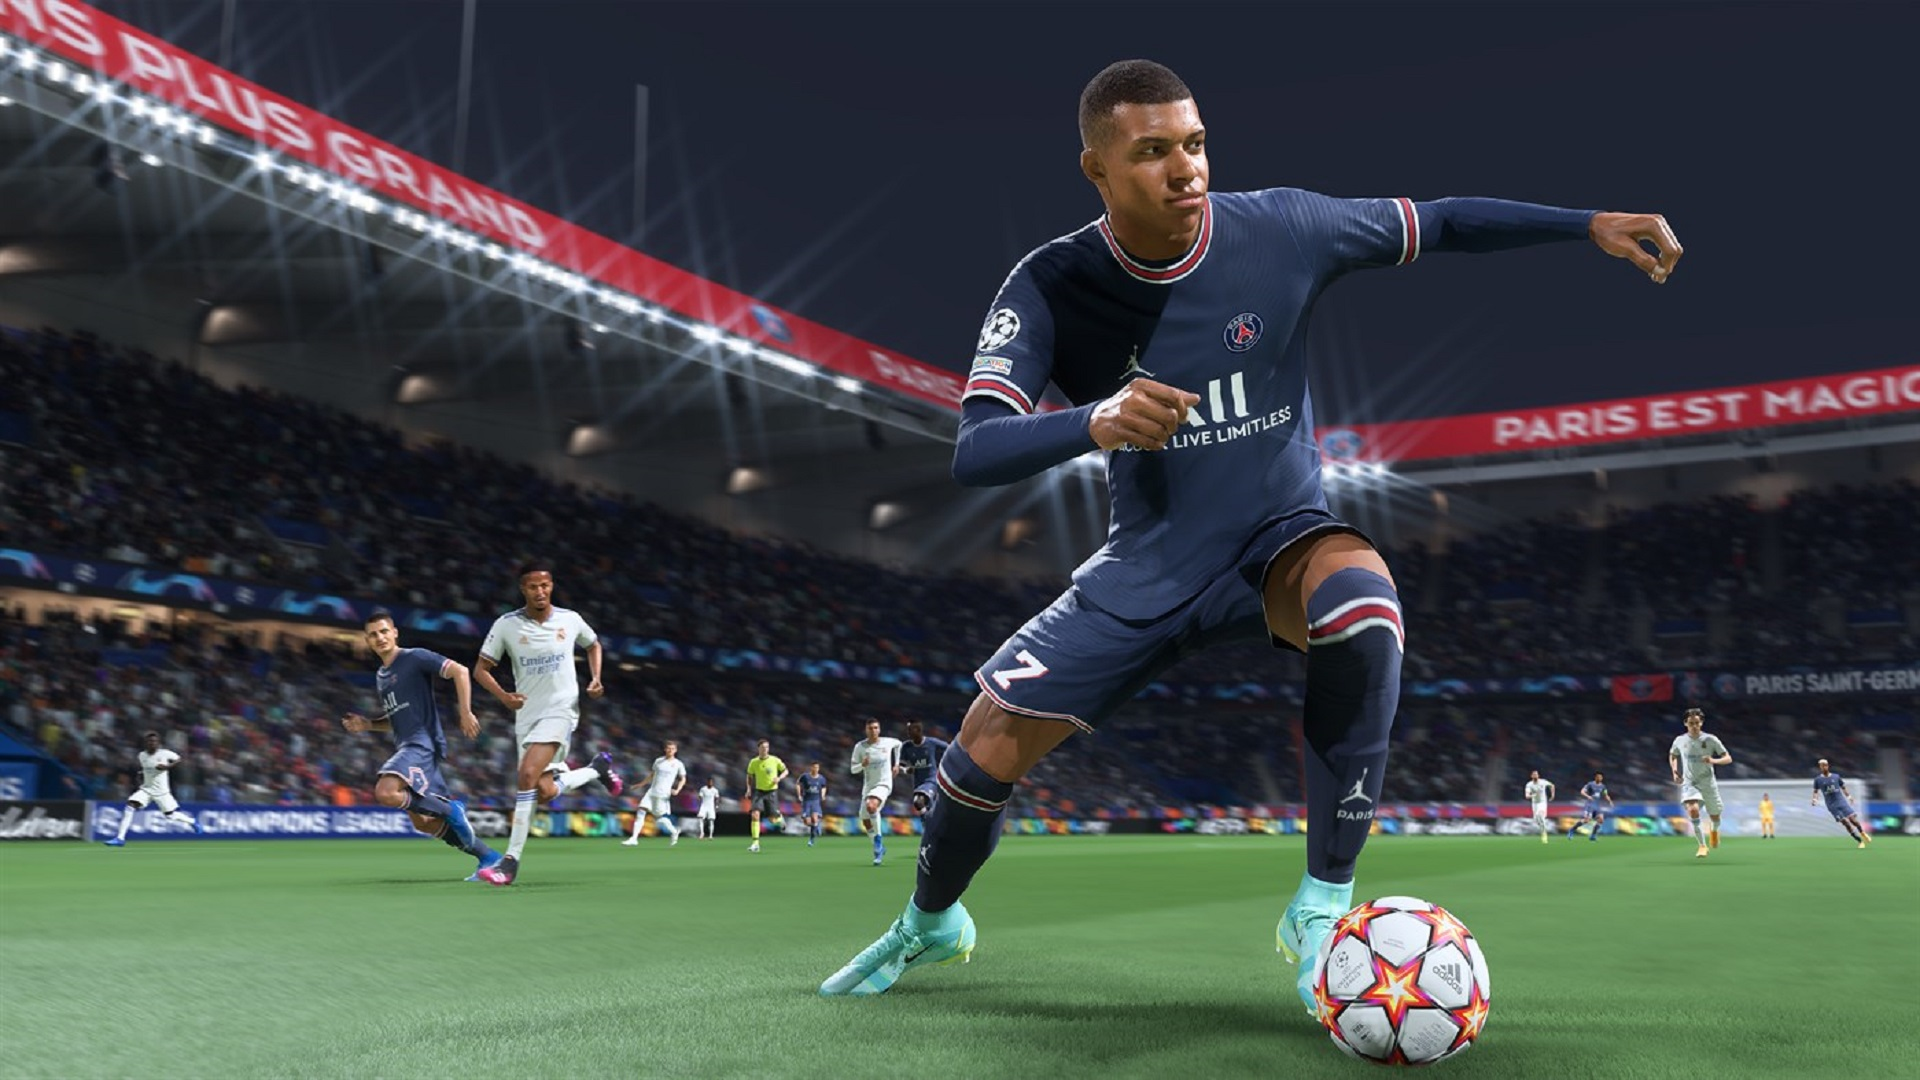 《FIFA 22》Xbox版容量约50 GB 次世代与上世代相同